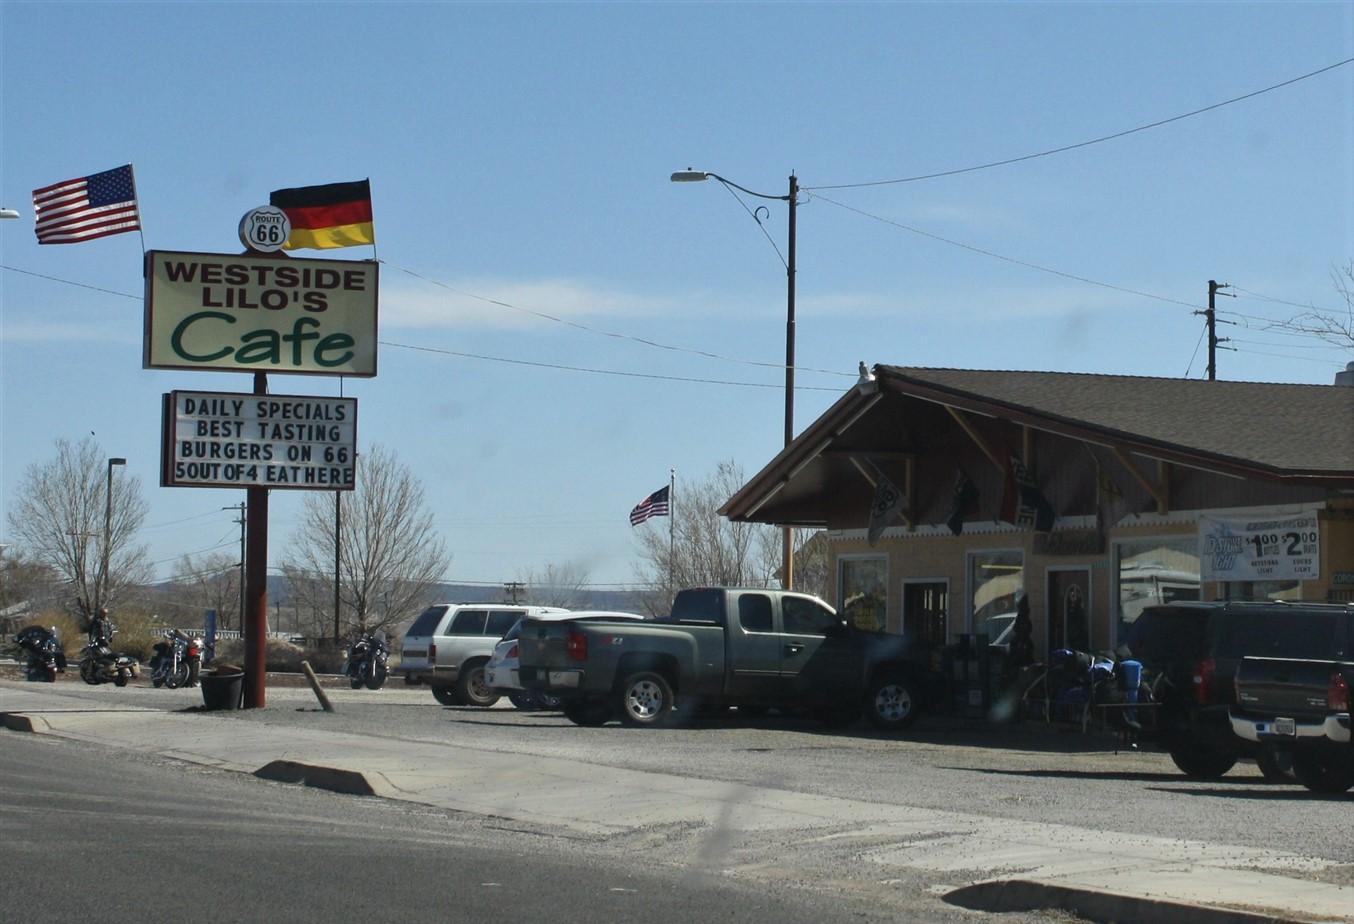 2012 03 14 Route 66 Road Trip 176 Seligman Arizona.jpg